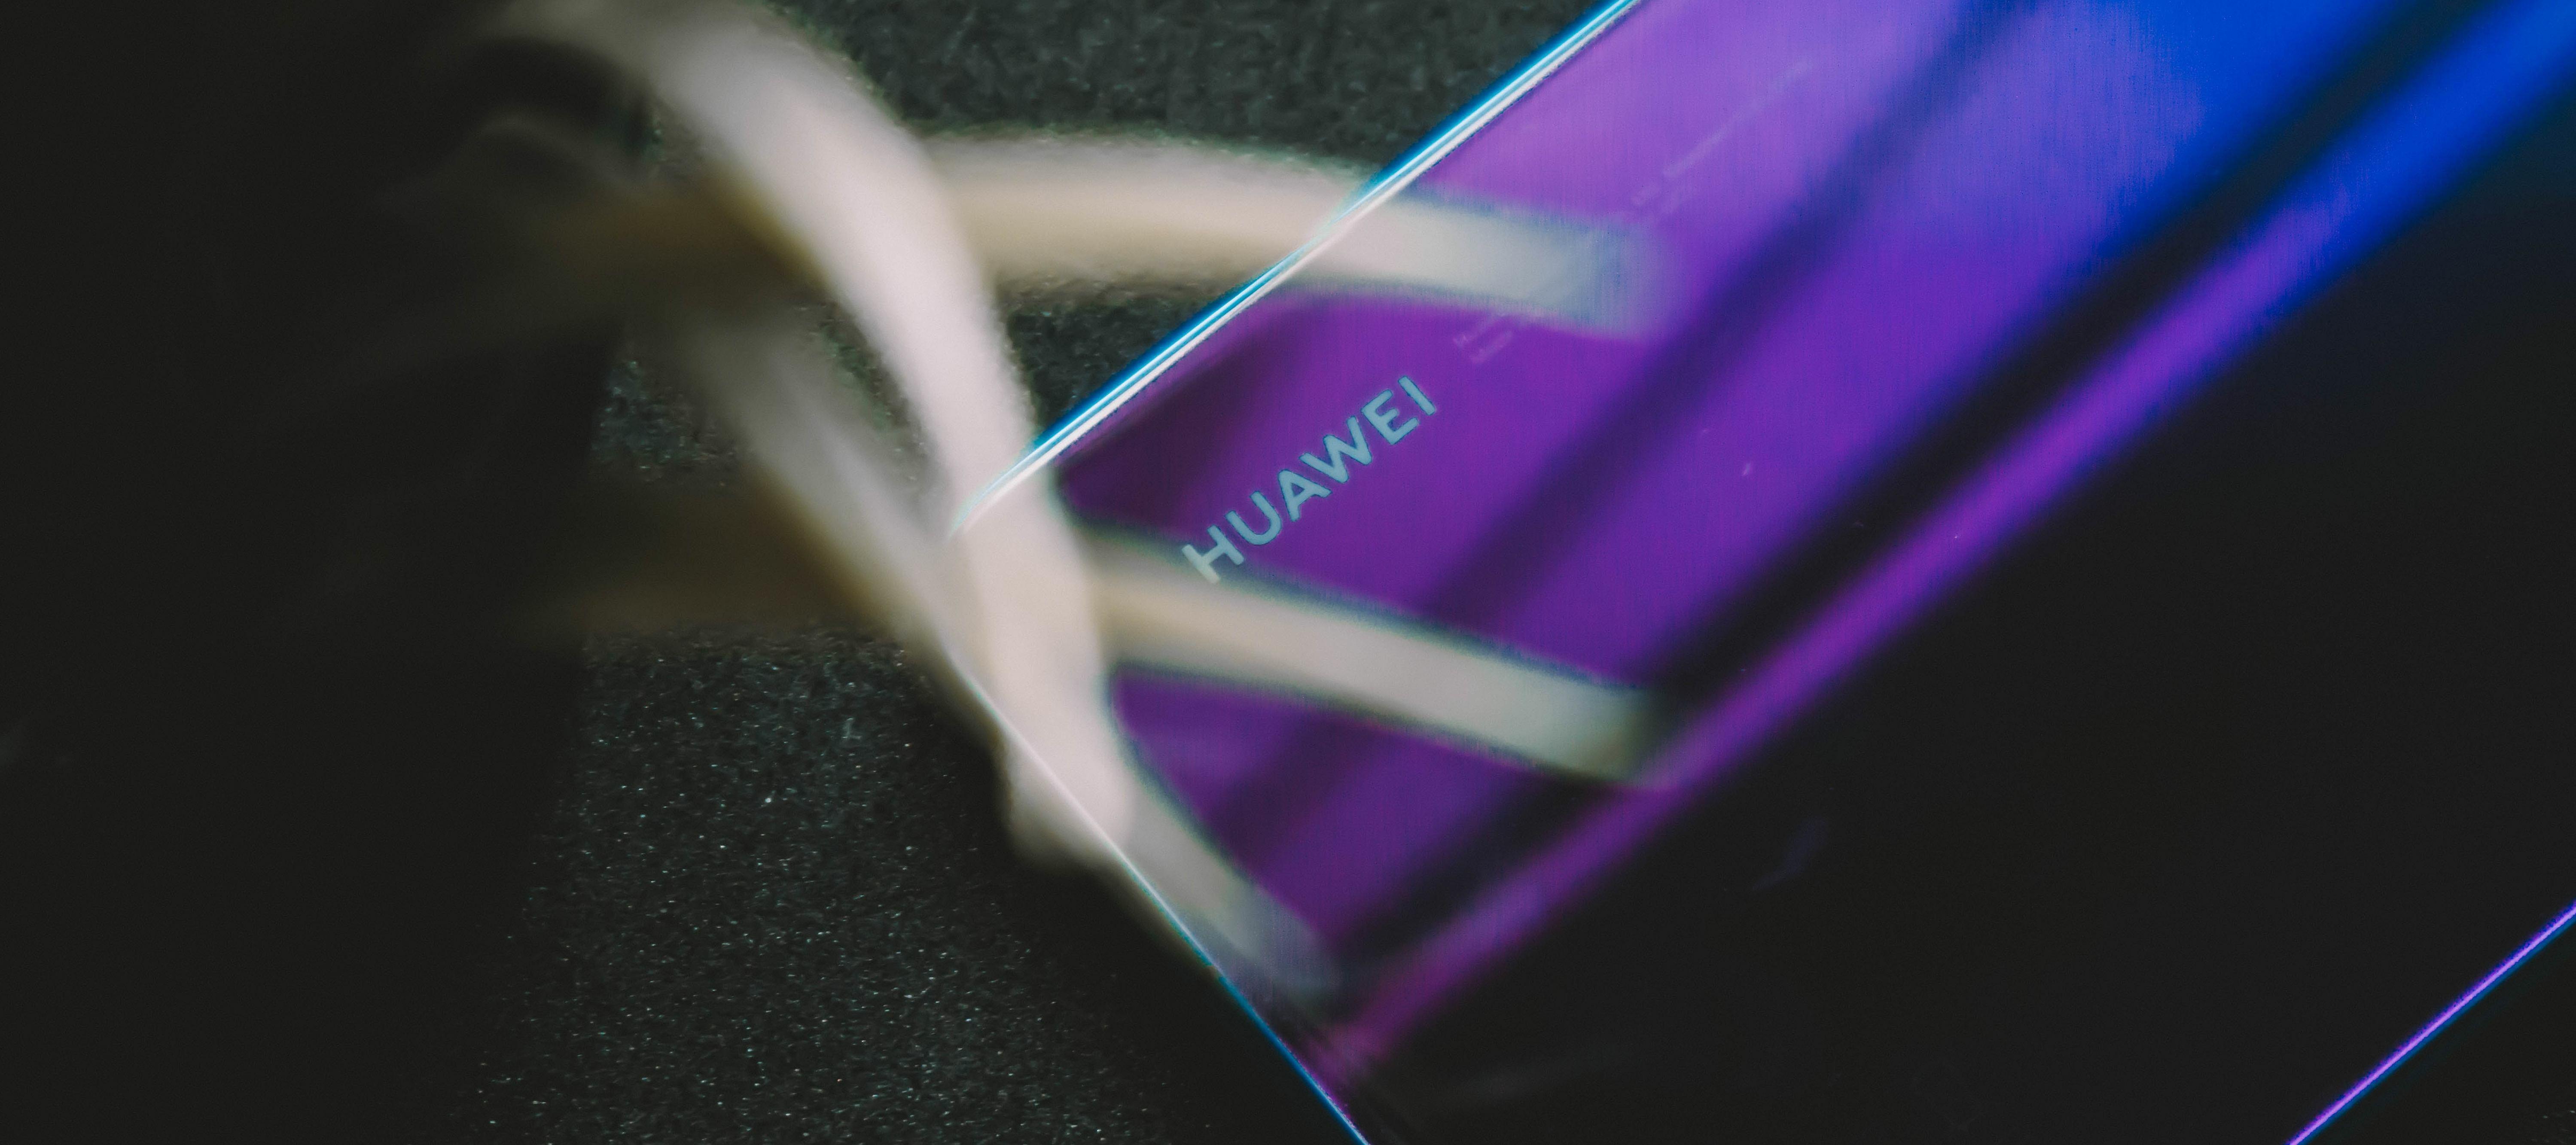 Huawei P30 lite - 2 Wochen Express Test